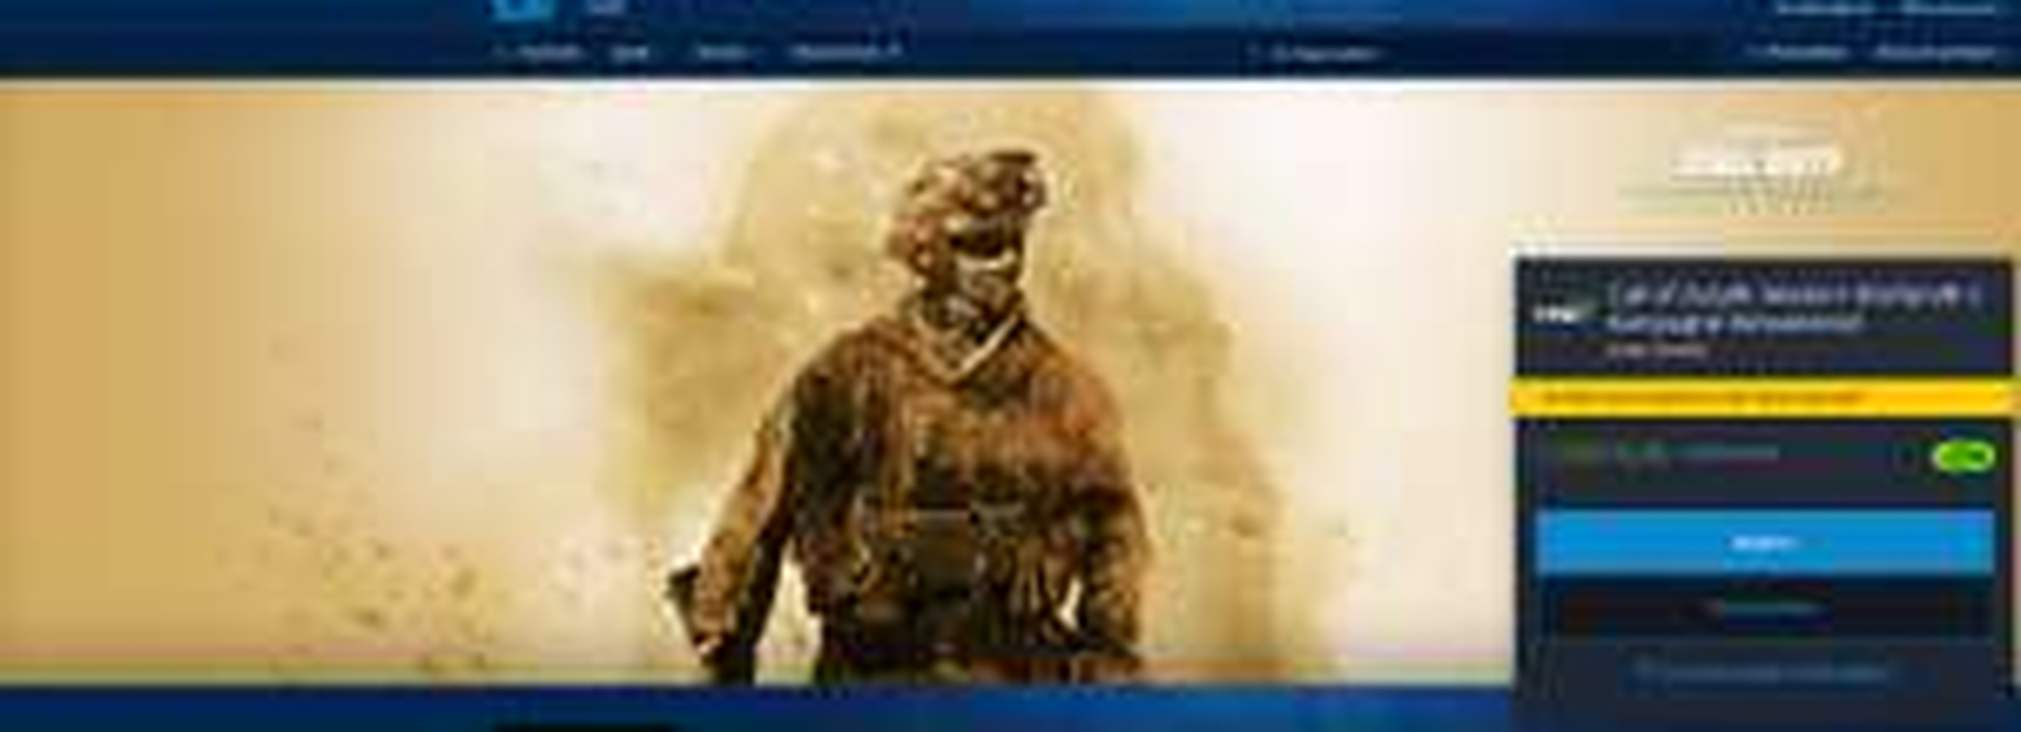 Call of Duty: Modern Warfare 2 Kampagne Remastered - Battle.net - Russland PC-Version (in Deutsch spielbar)